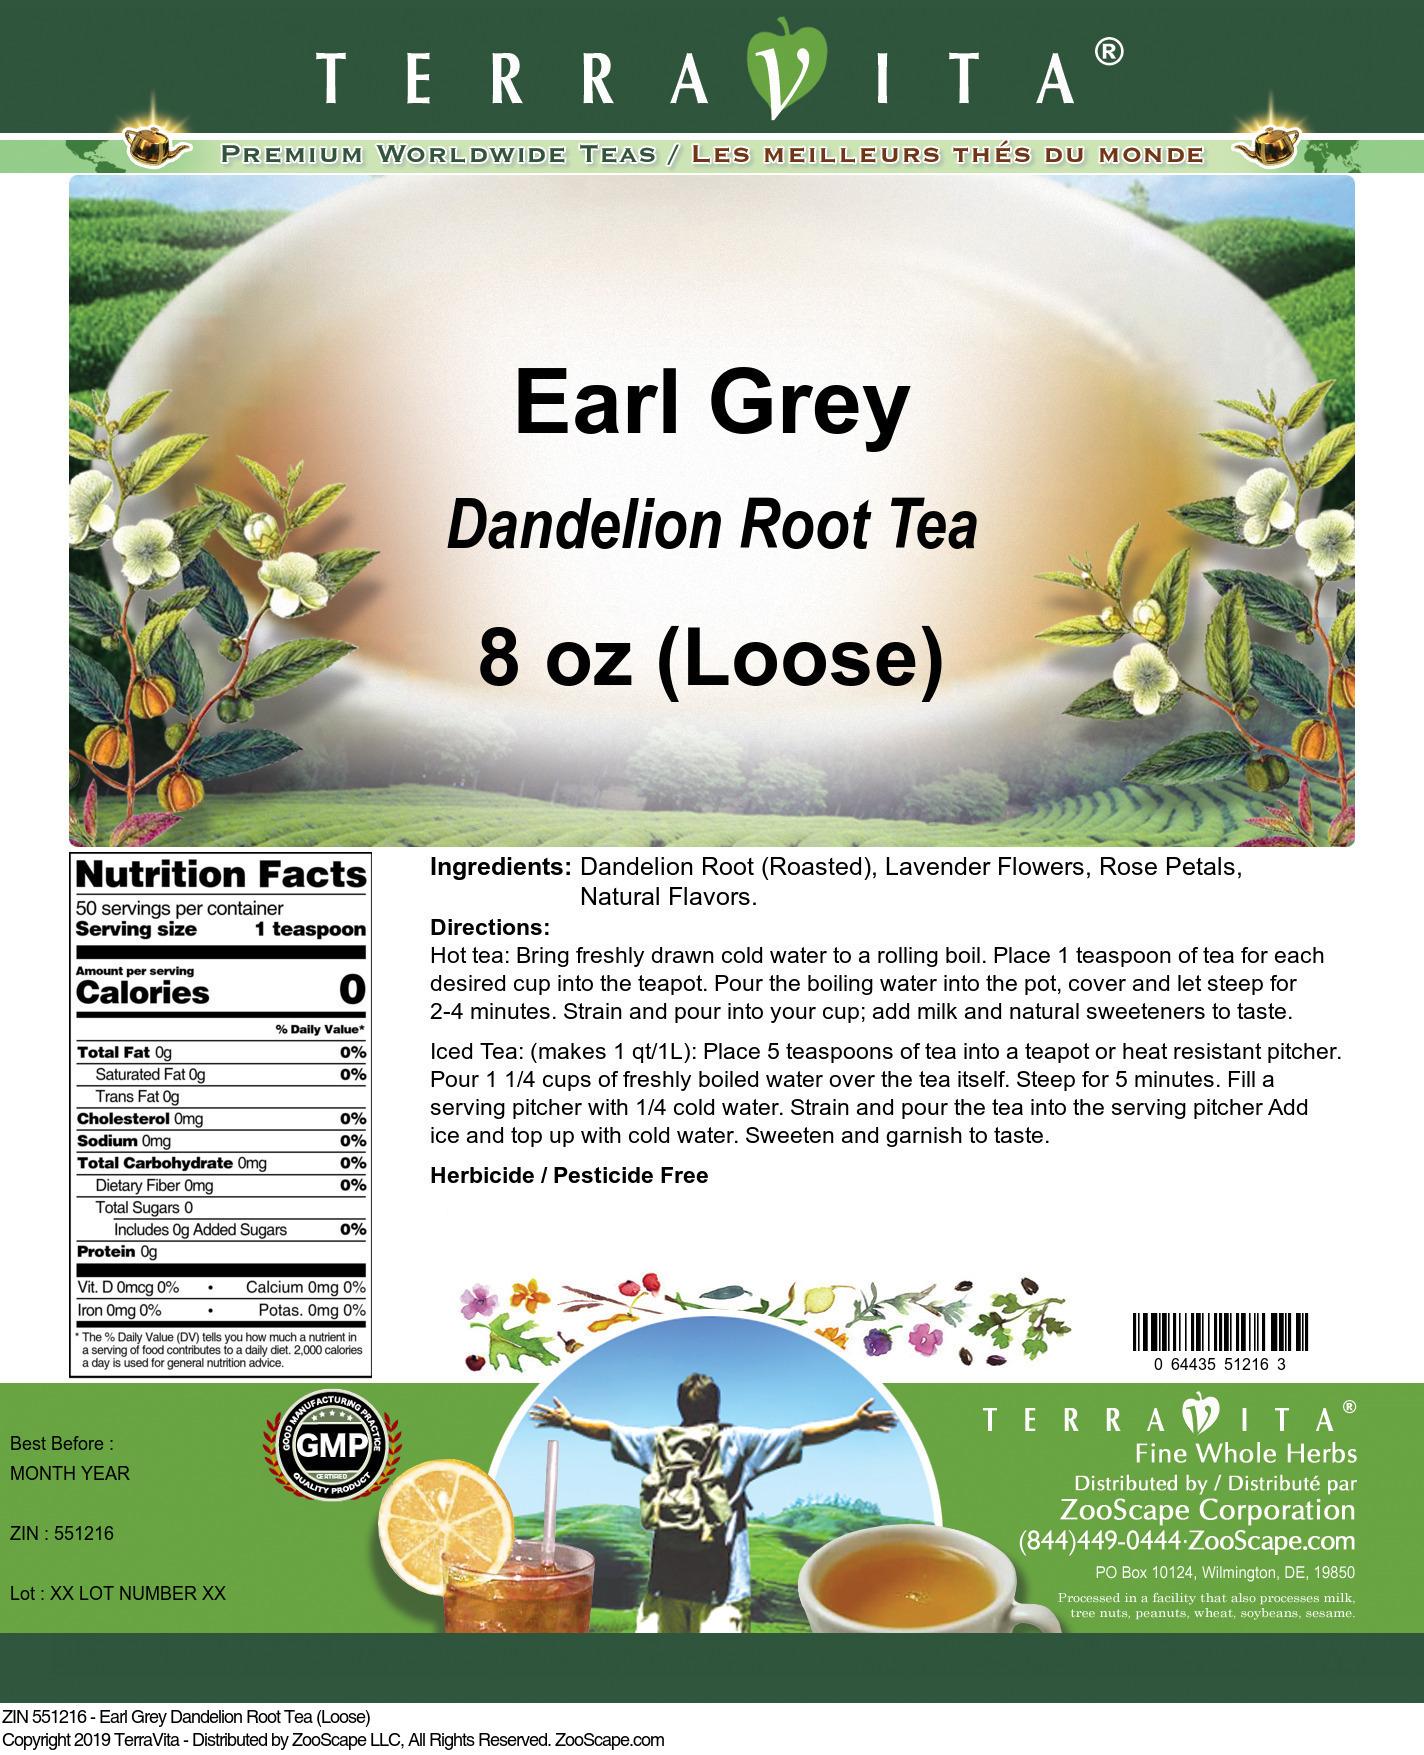 Earl Grey Dandelion Root